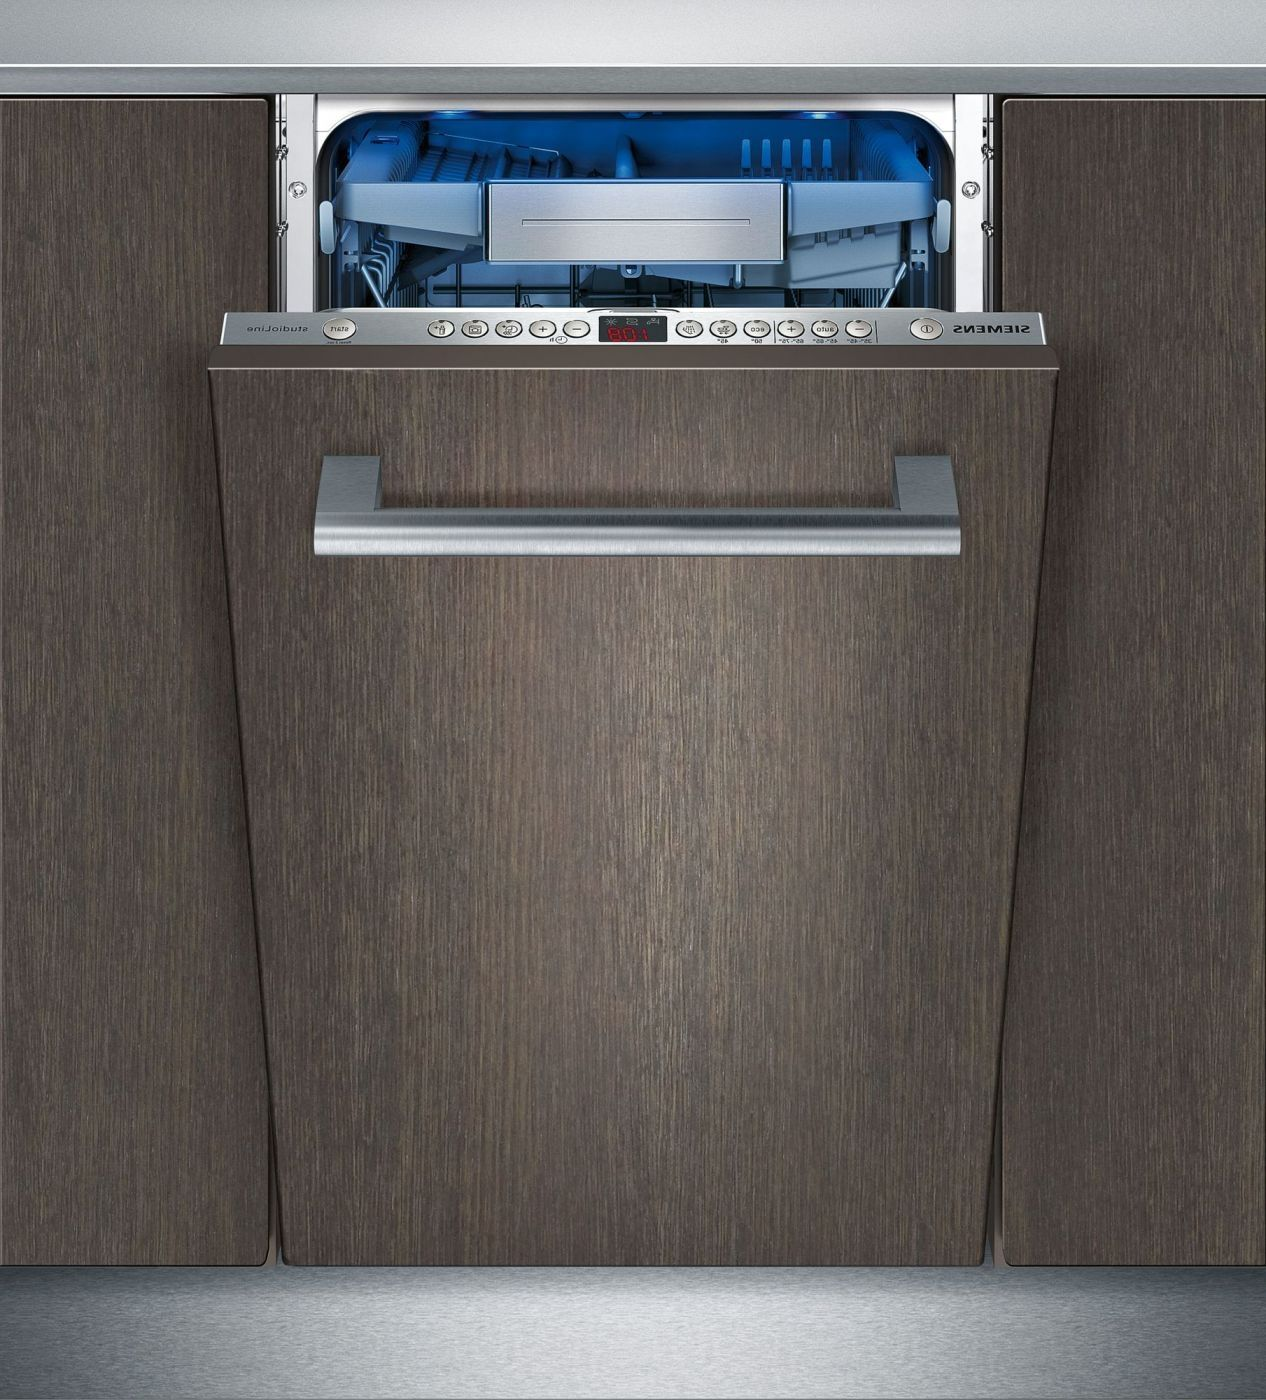 Spülmaschine 45 Cm Vollintegrierbar 2019 (Dengan gambar)